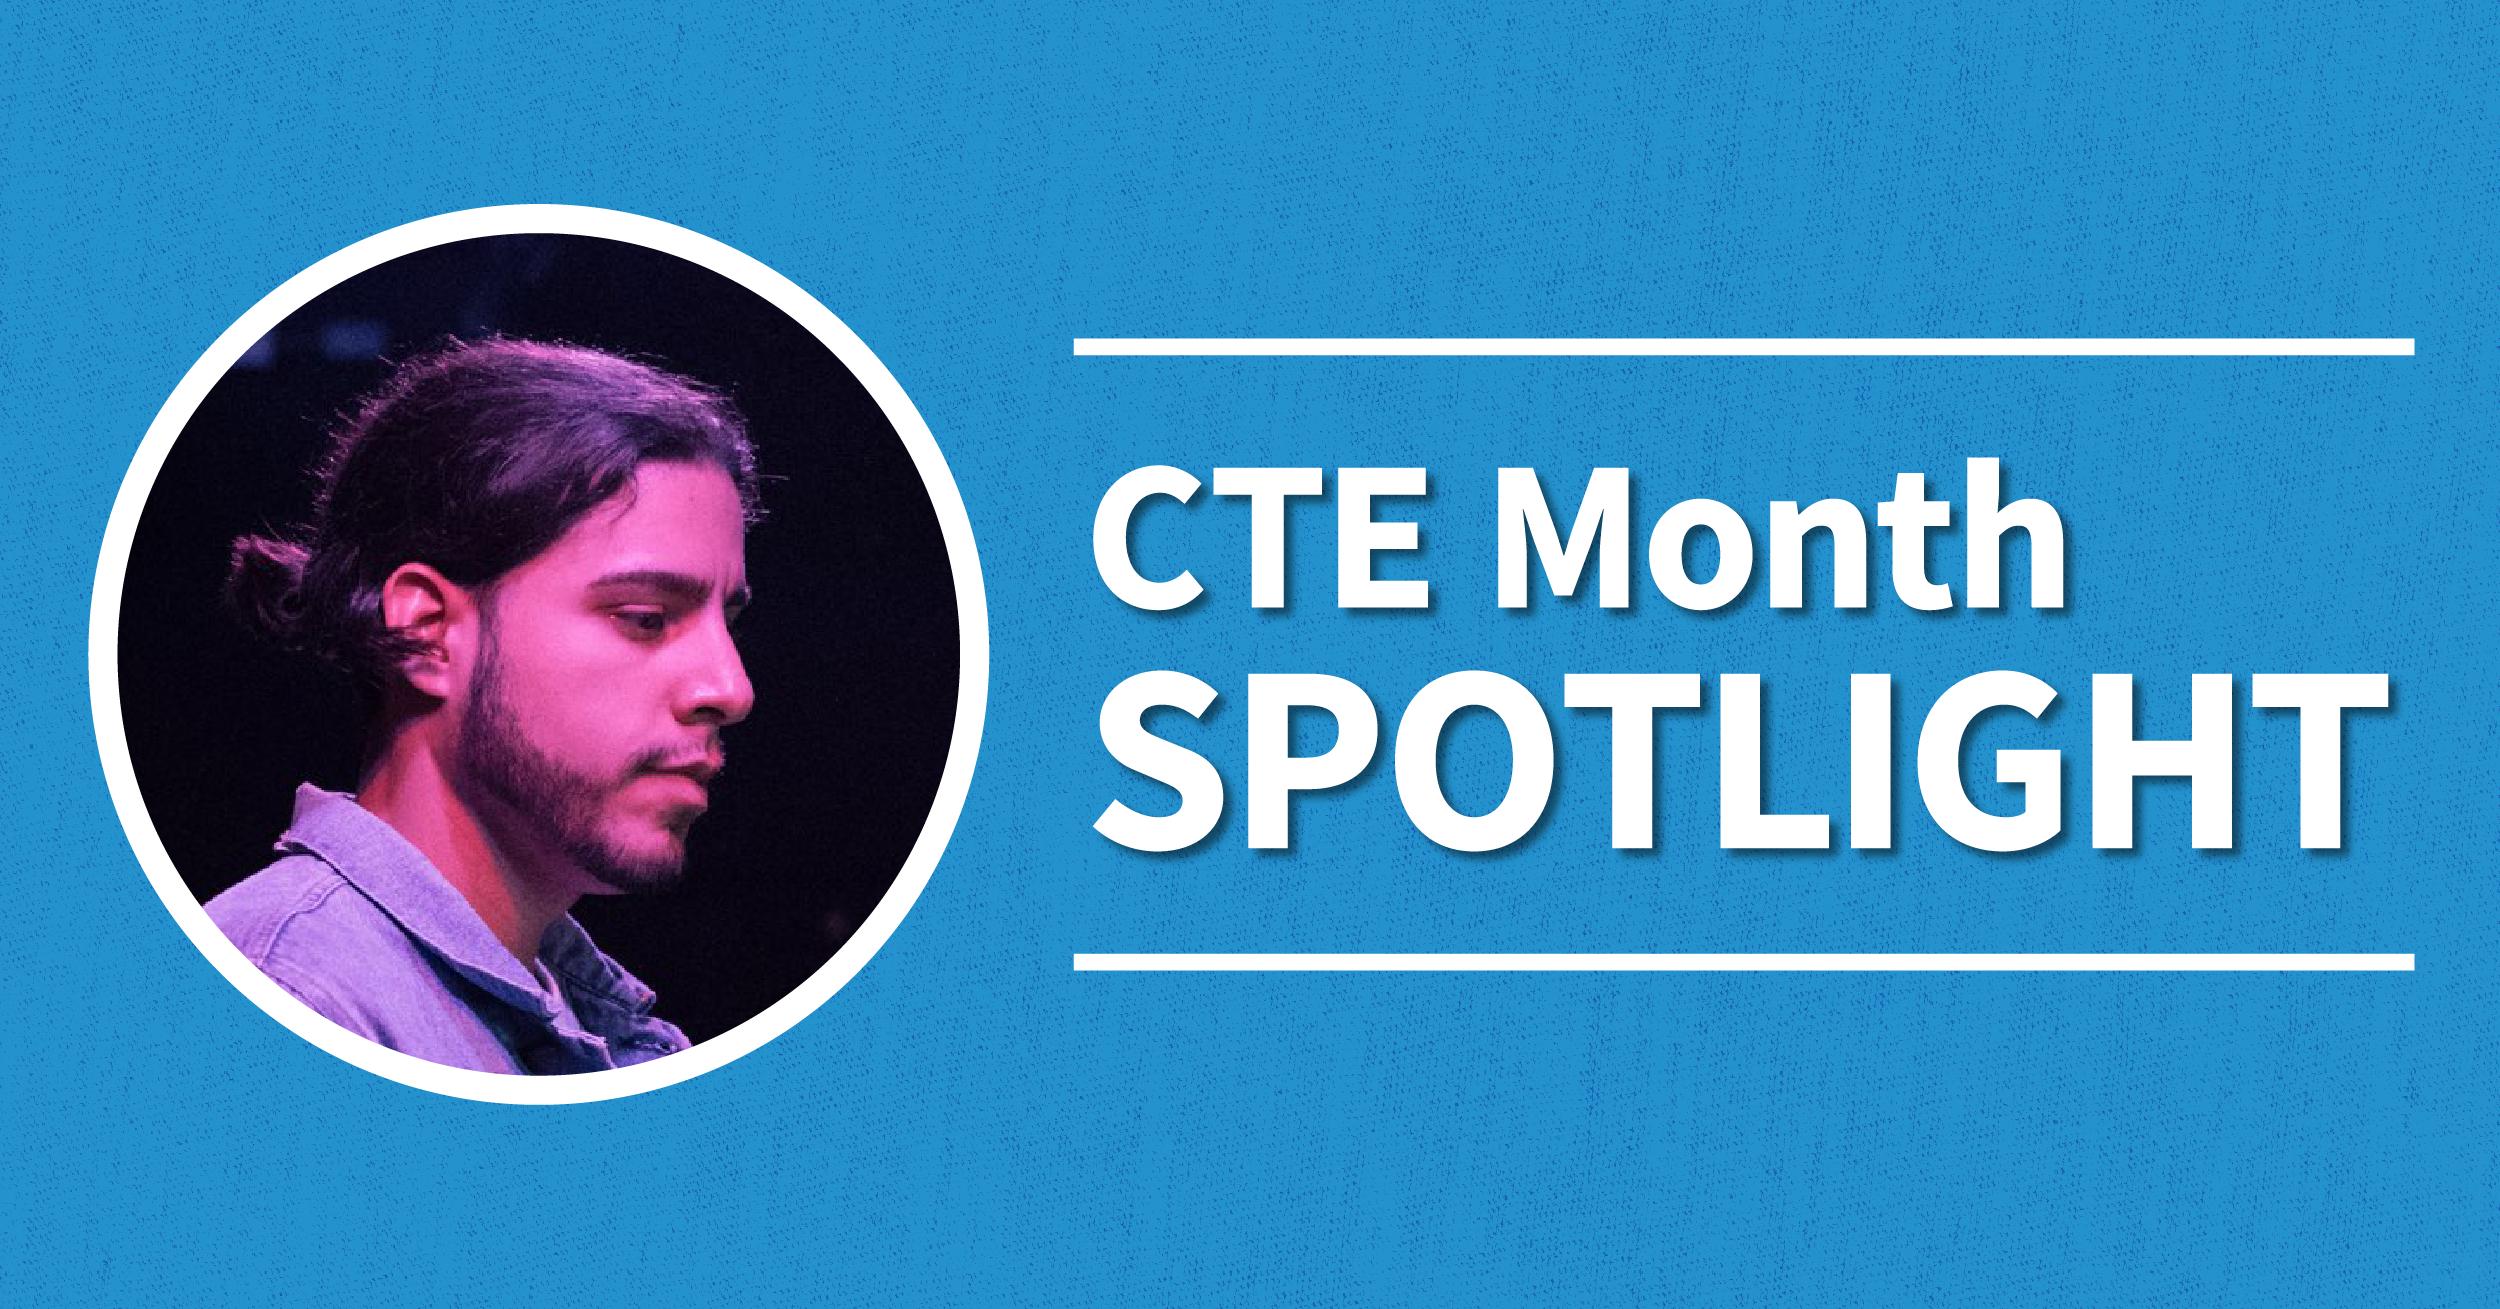 CTE Month Spotlight. Student pictured is Reily Cruz.